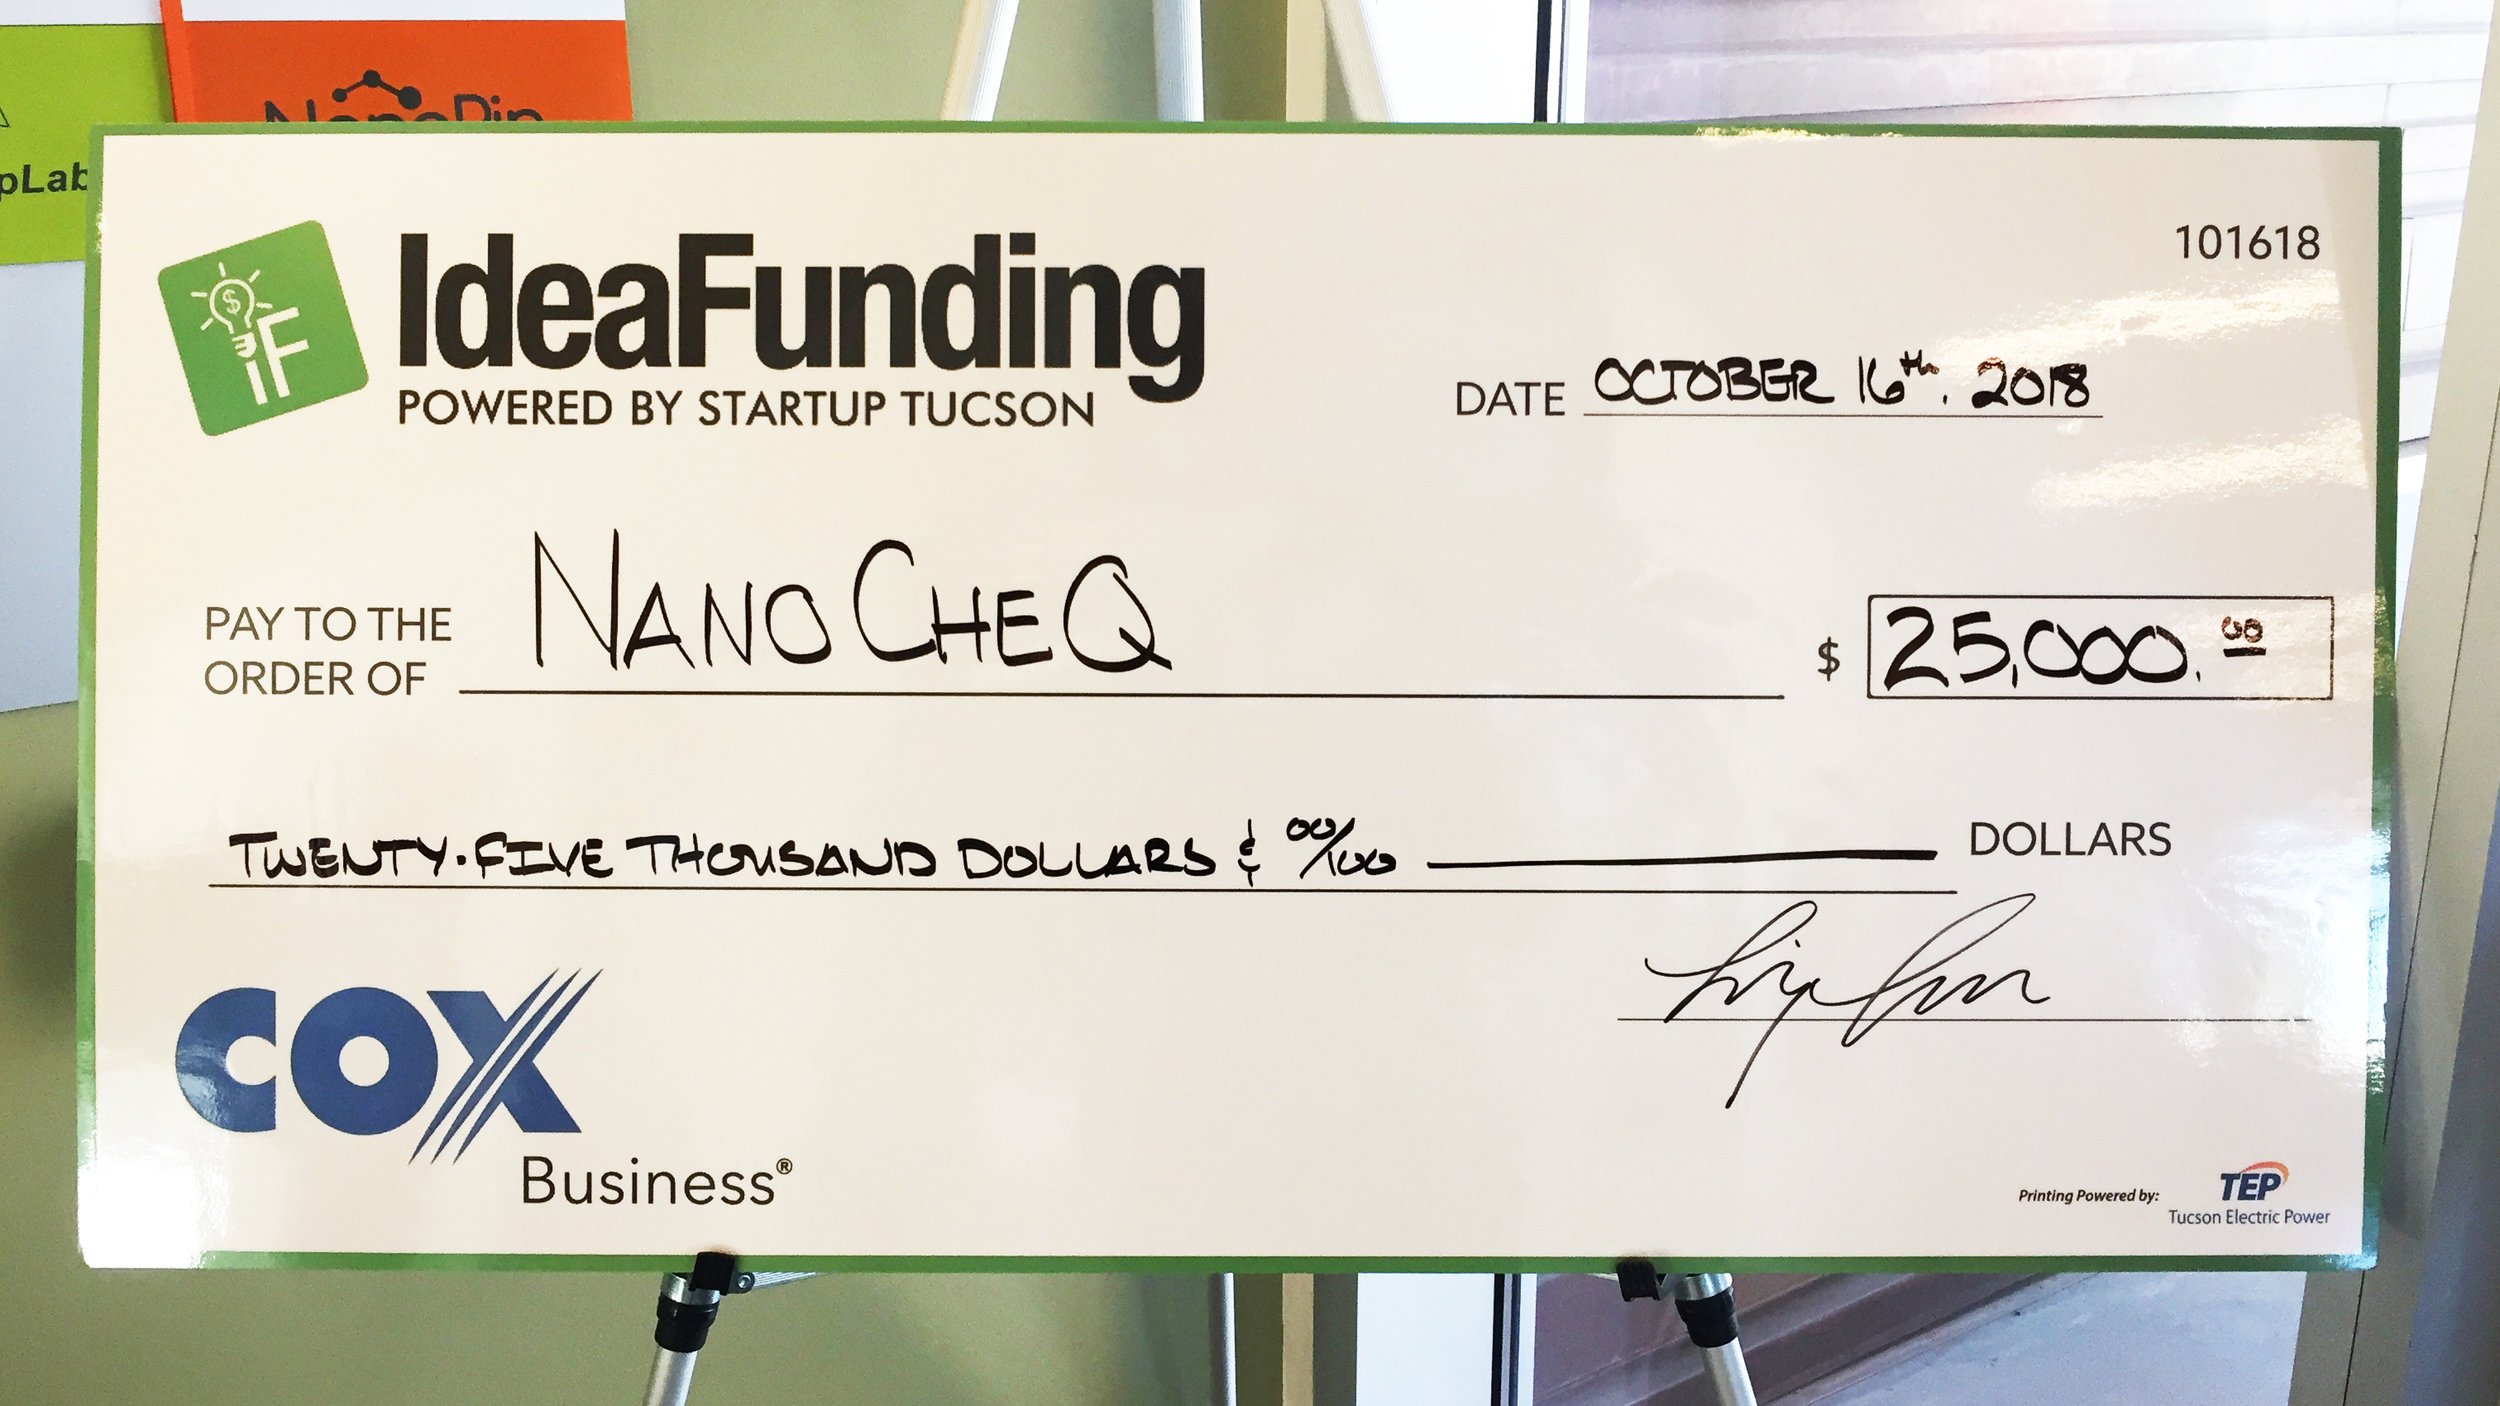 NanoCheq-IdeaFunding.jpg